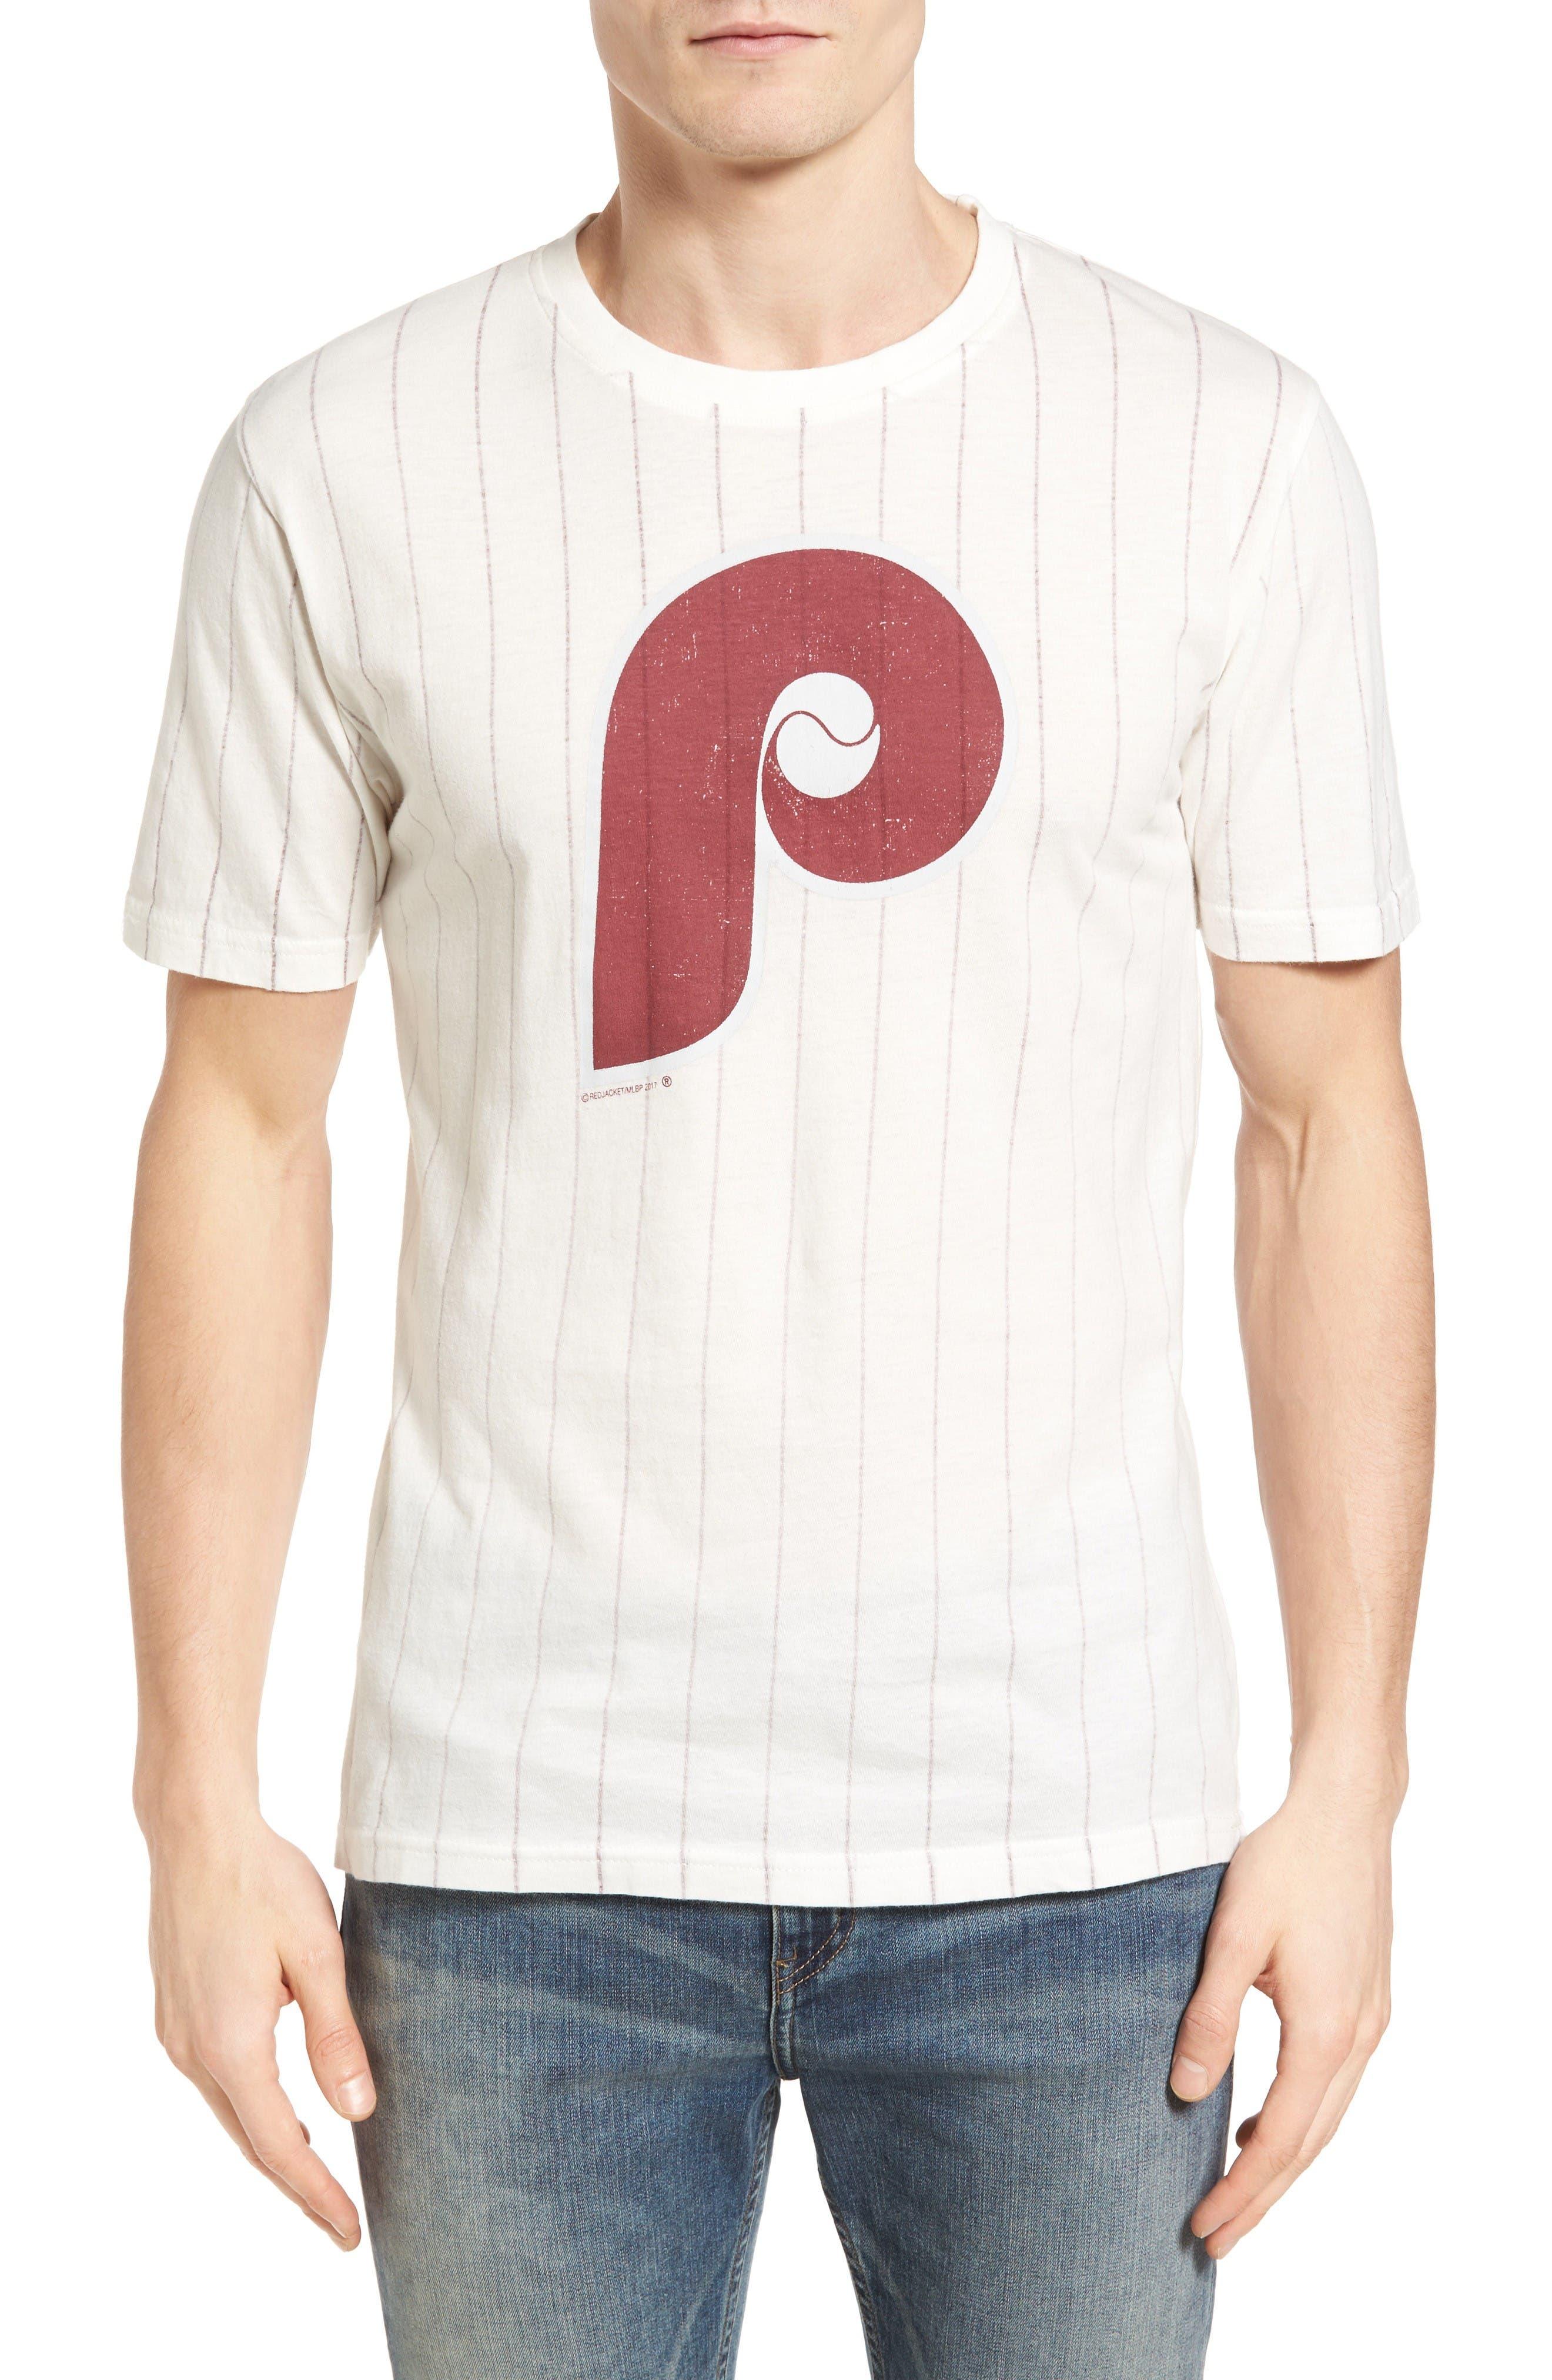 Main Image - American Needle Brass Tack Philadelphia Phillies T-Shirt